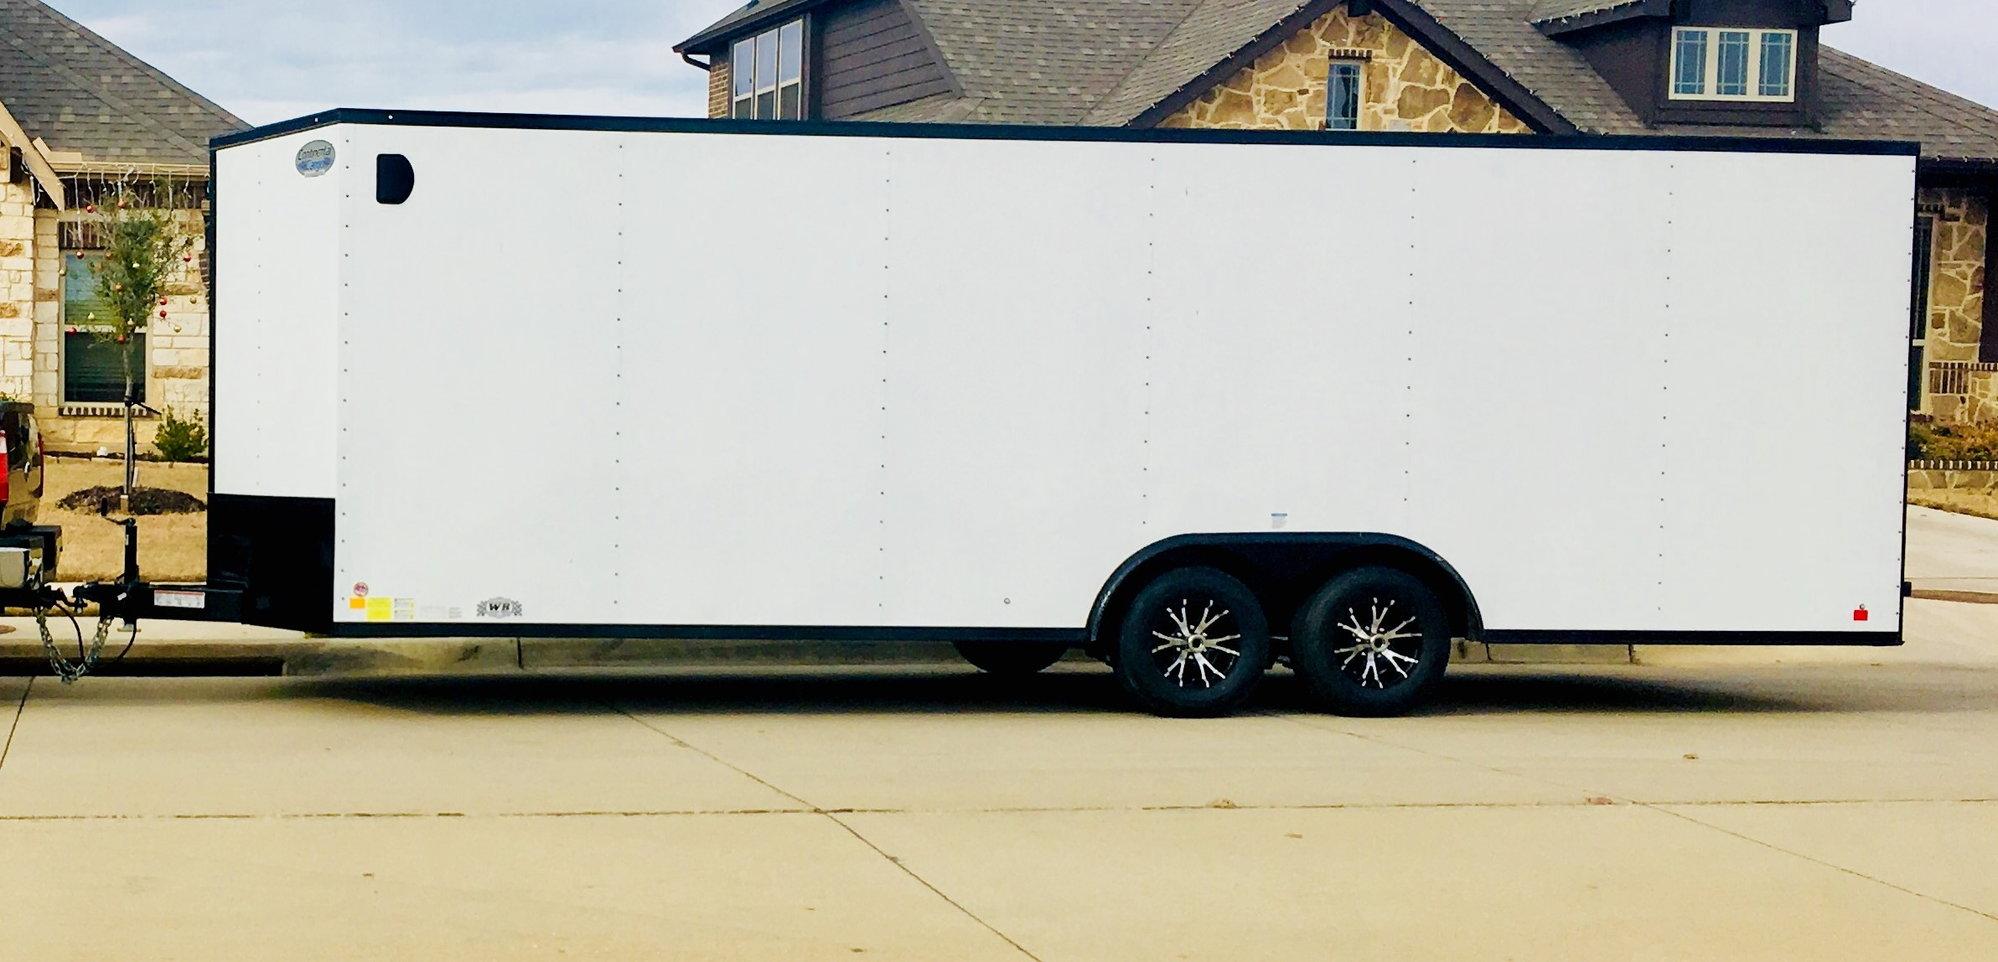 FS (For Sale) 24 ft Enclosed Trailer - CorvetteForum ...